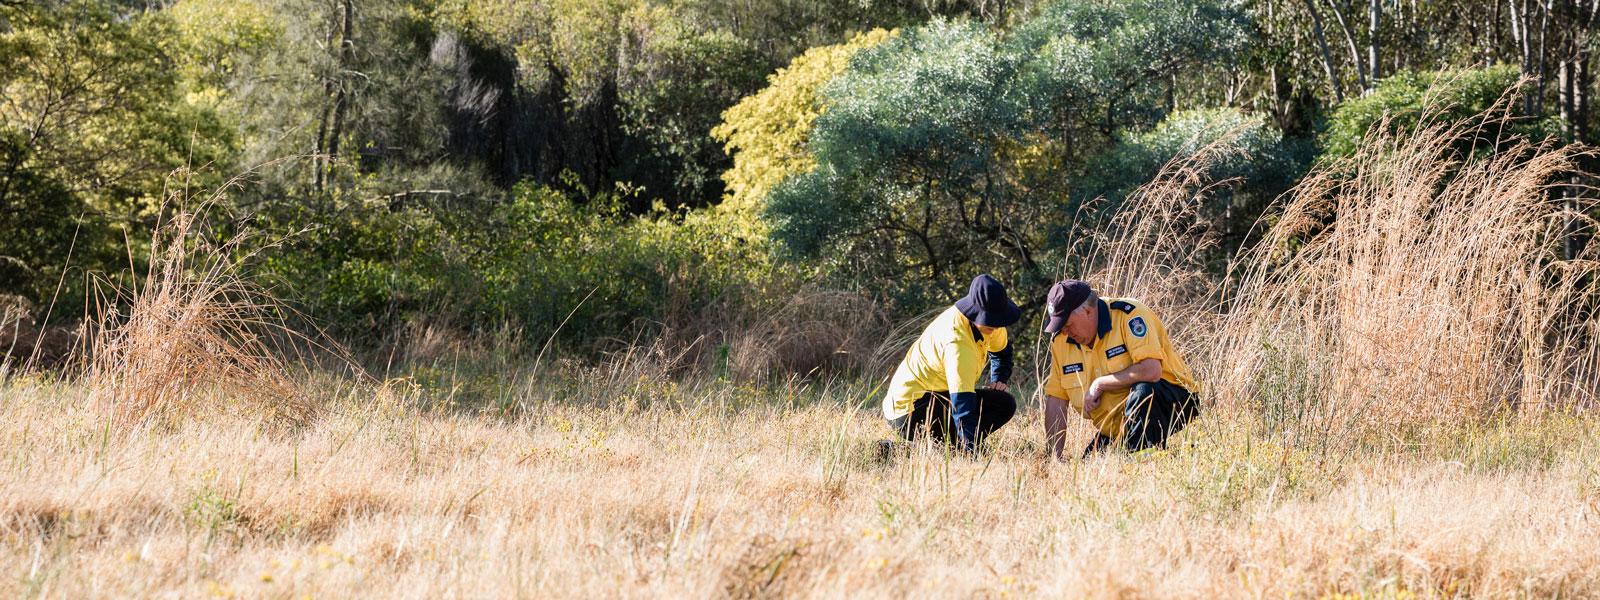 Image of RFS officers looking in dry bush land